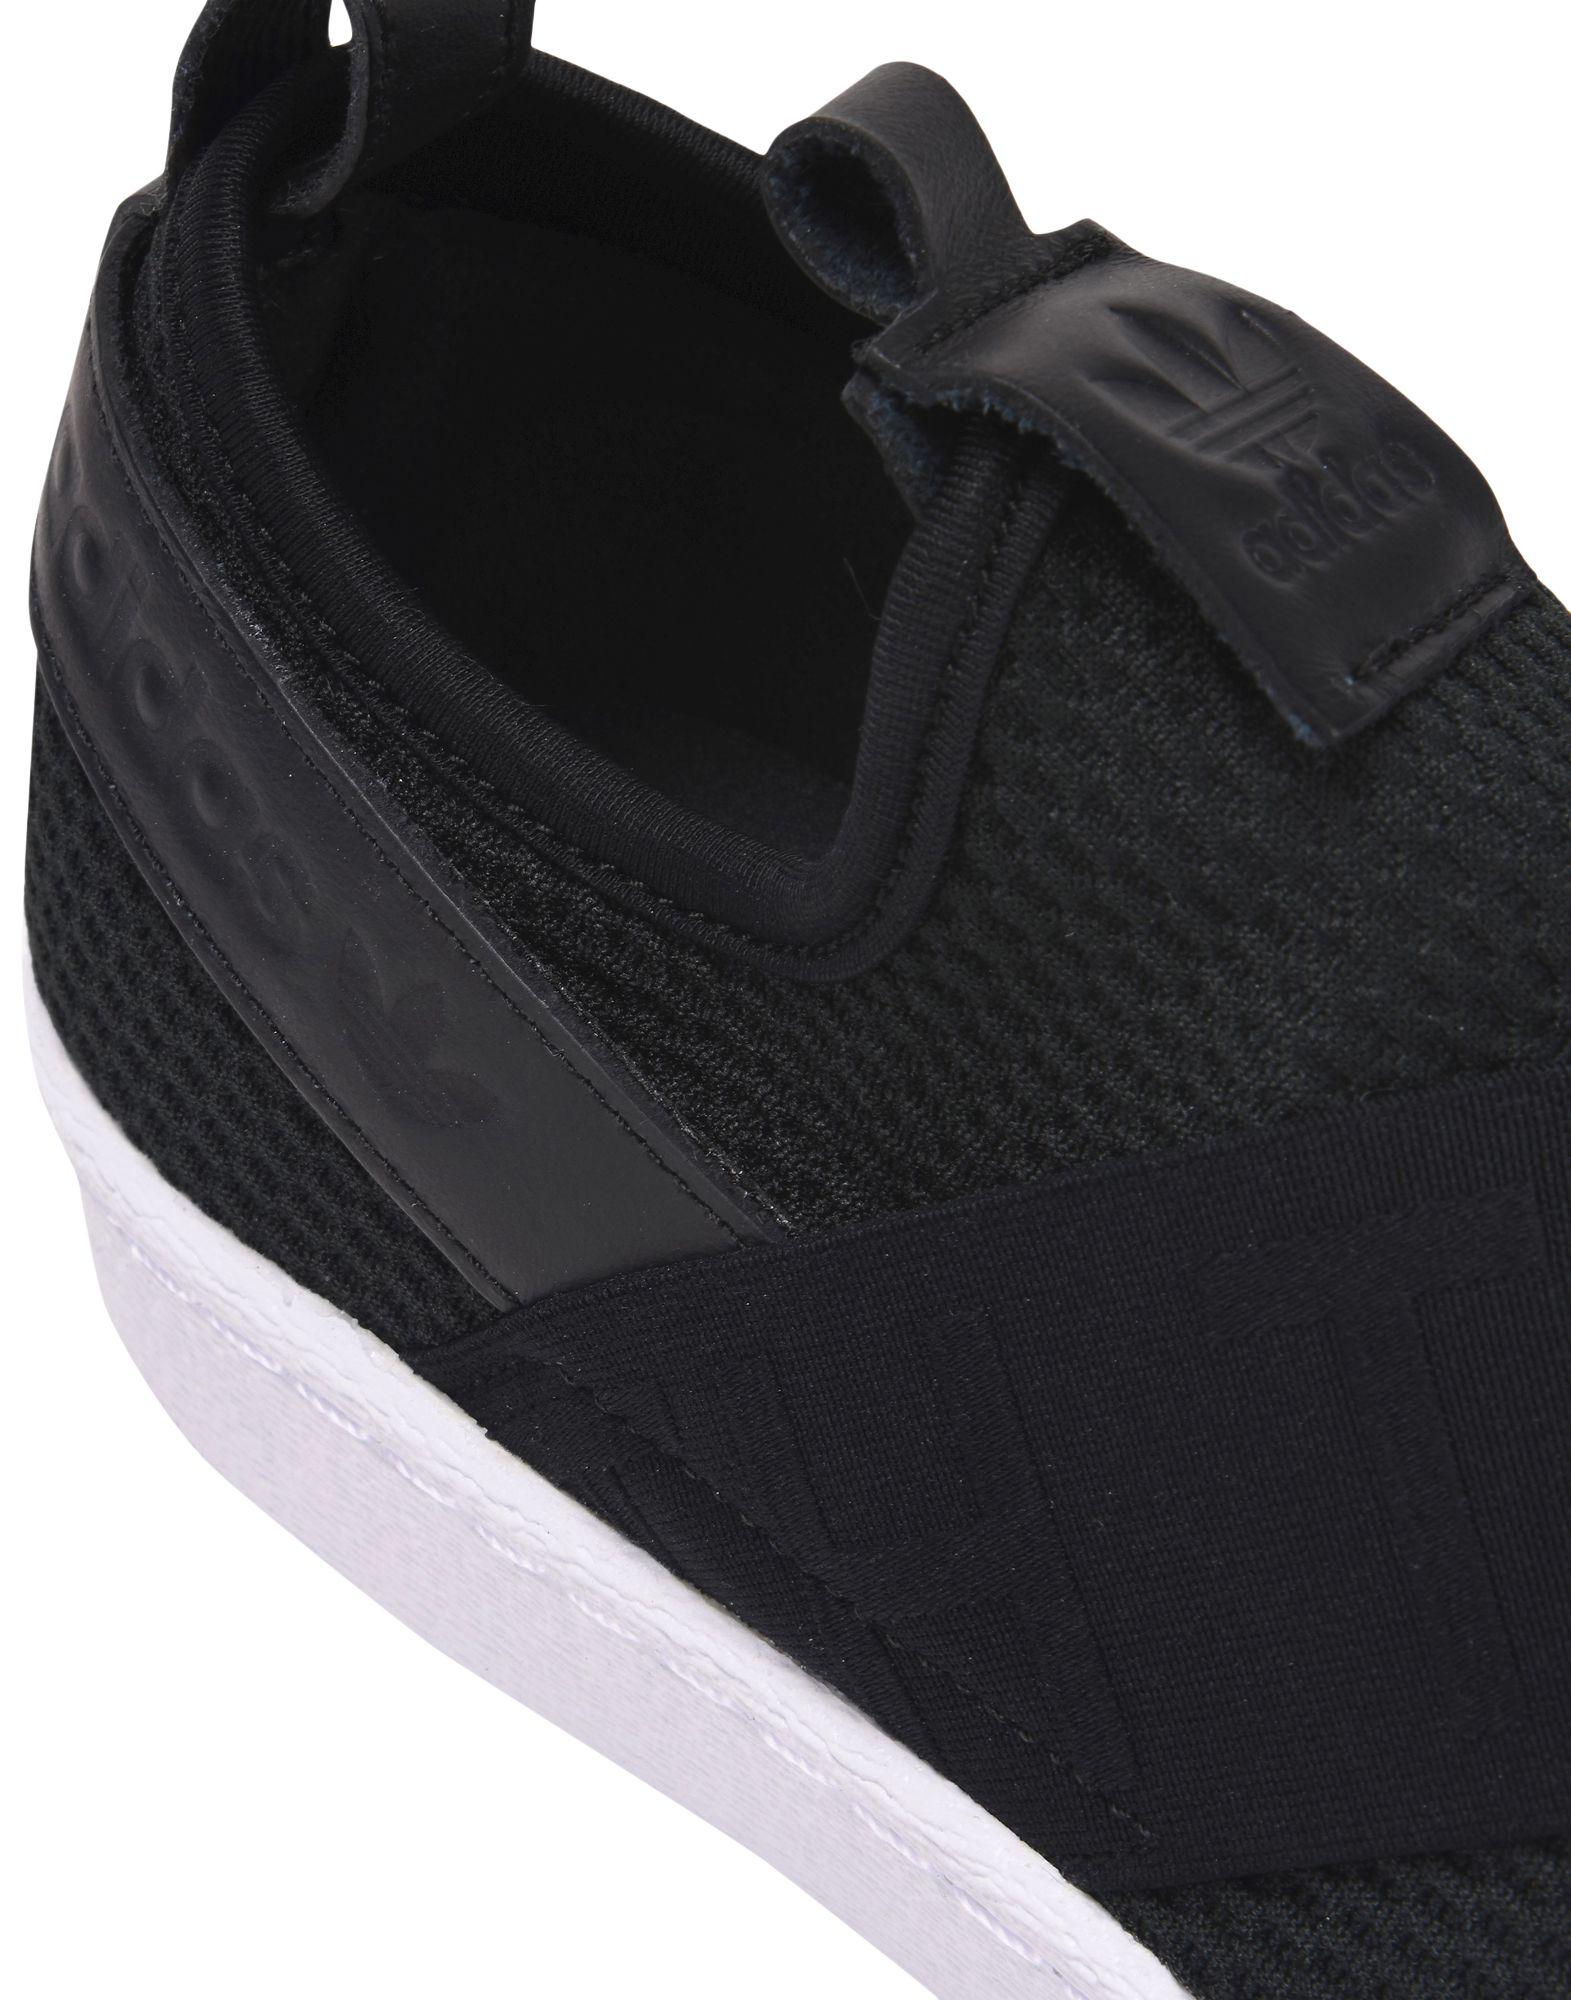 Sneakers Adidas Originals Superstar Slipon W - Femme - Sneakers Adidas Originals sur